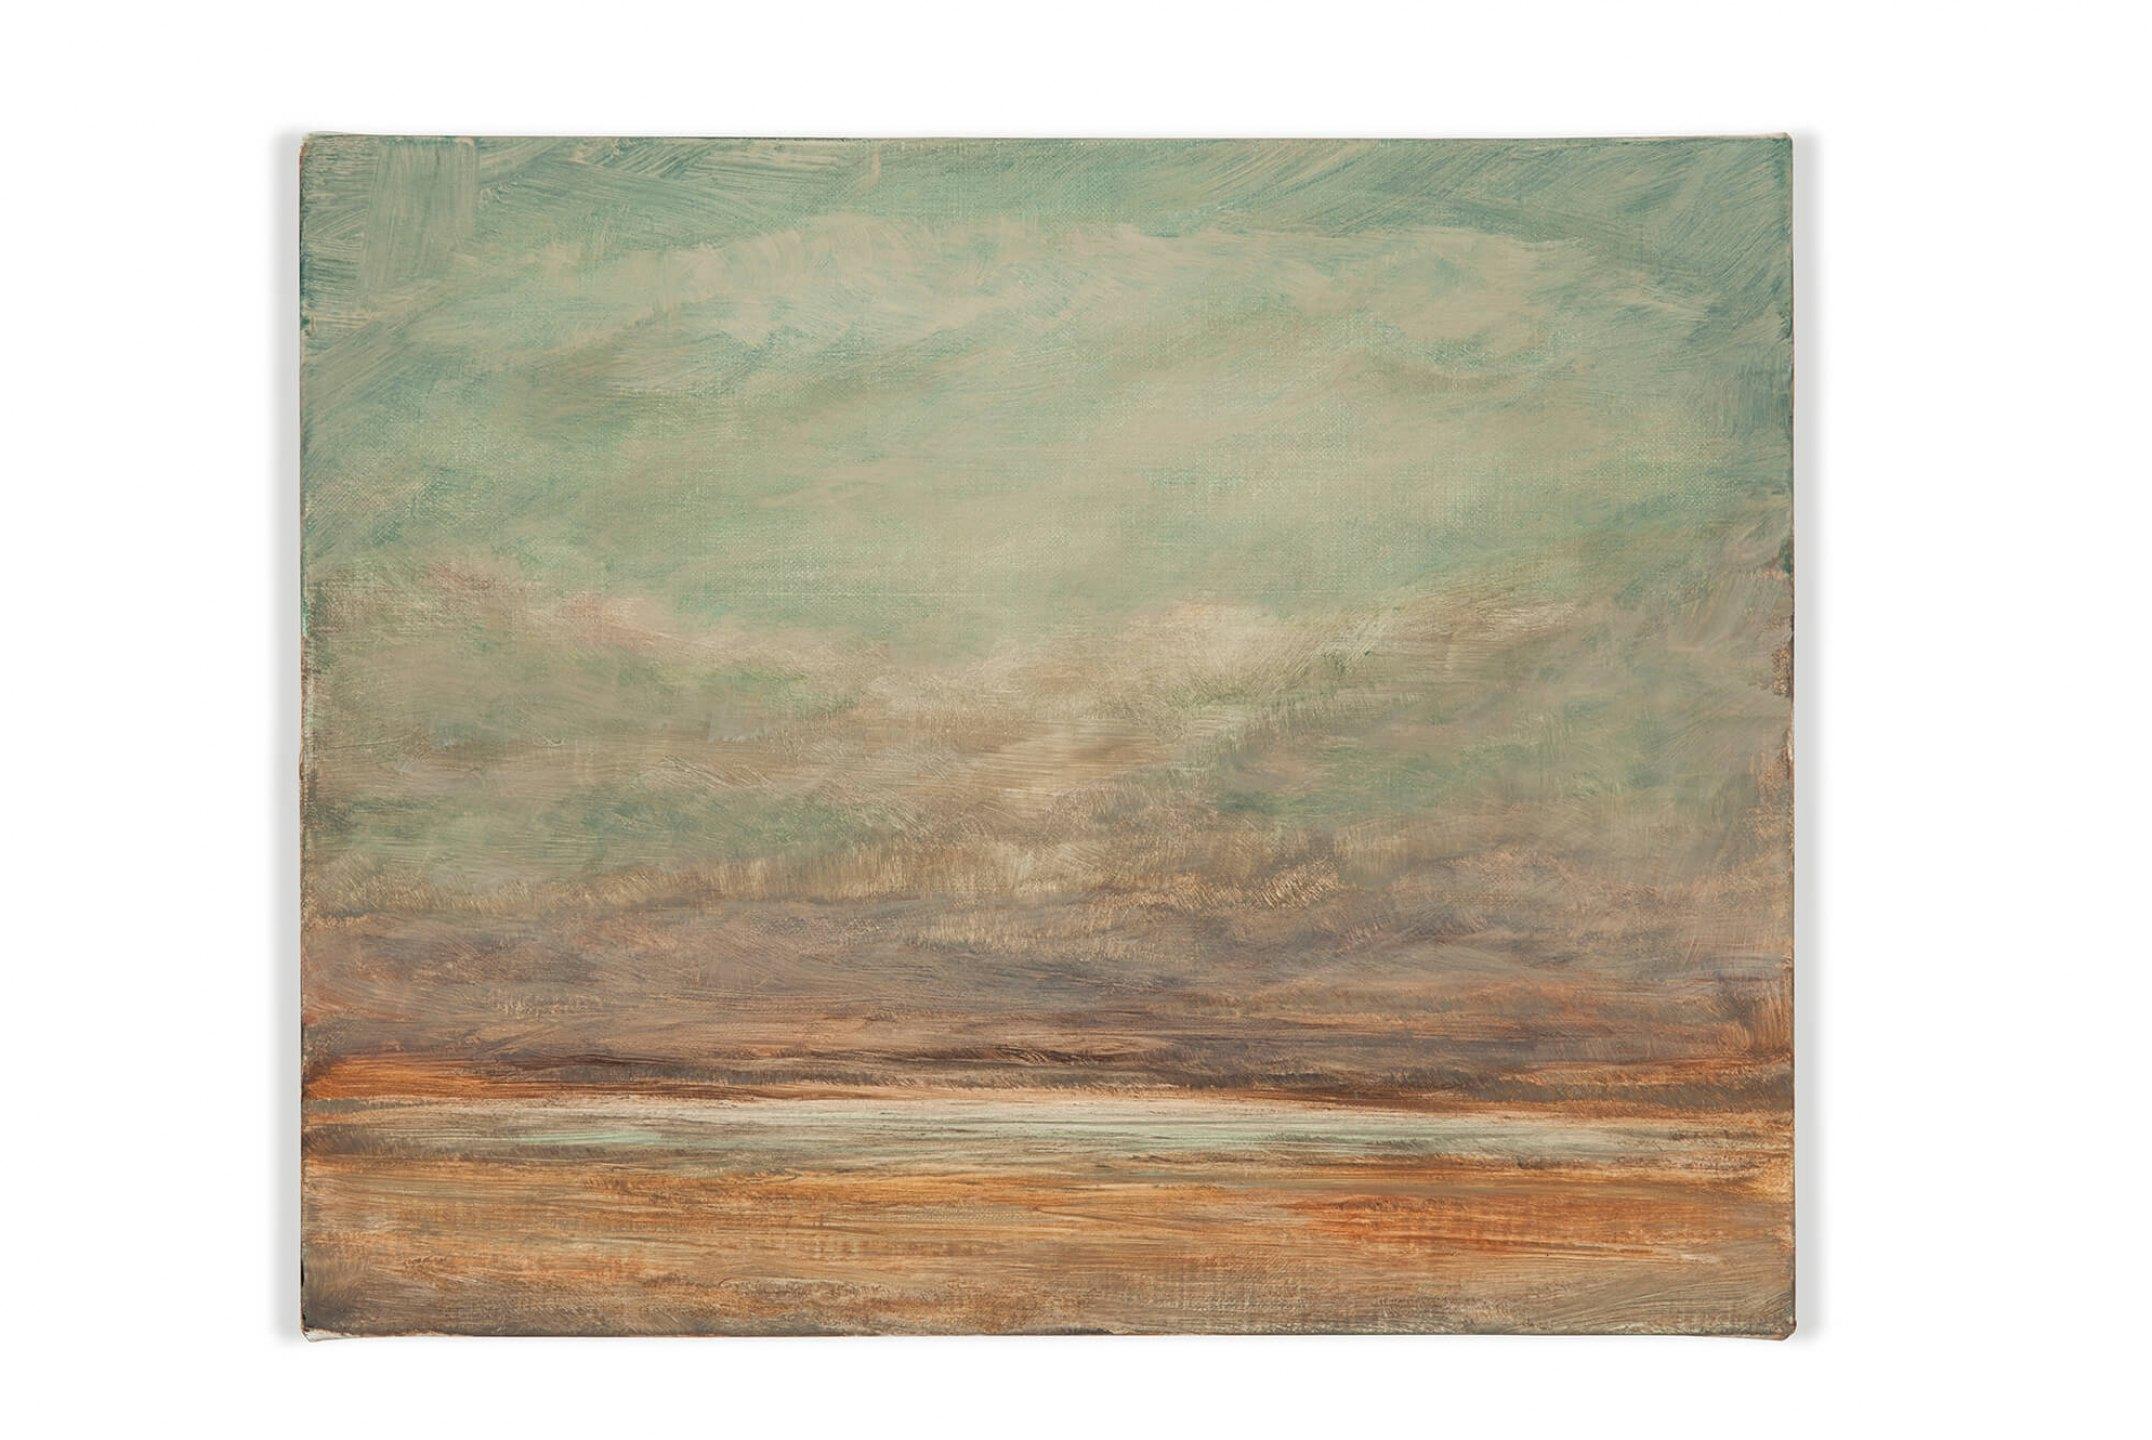 Lucas Arruda,<i>&nbsp;untitled</i>,&nbsp;2014, oil on canvas, 24,5 × 30 cm - Mendes Wood DM